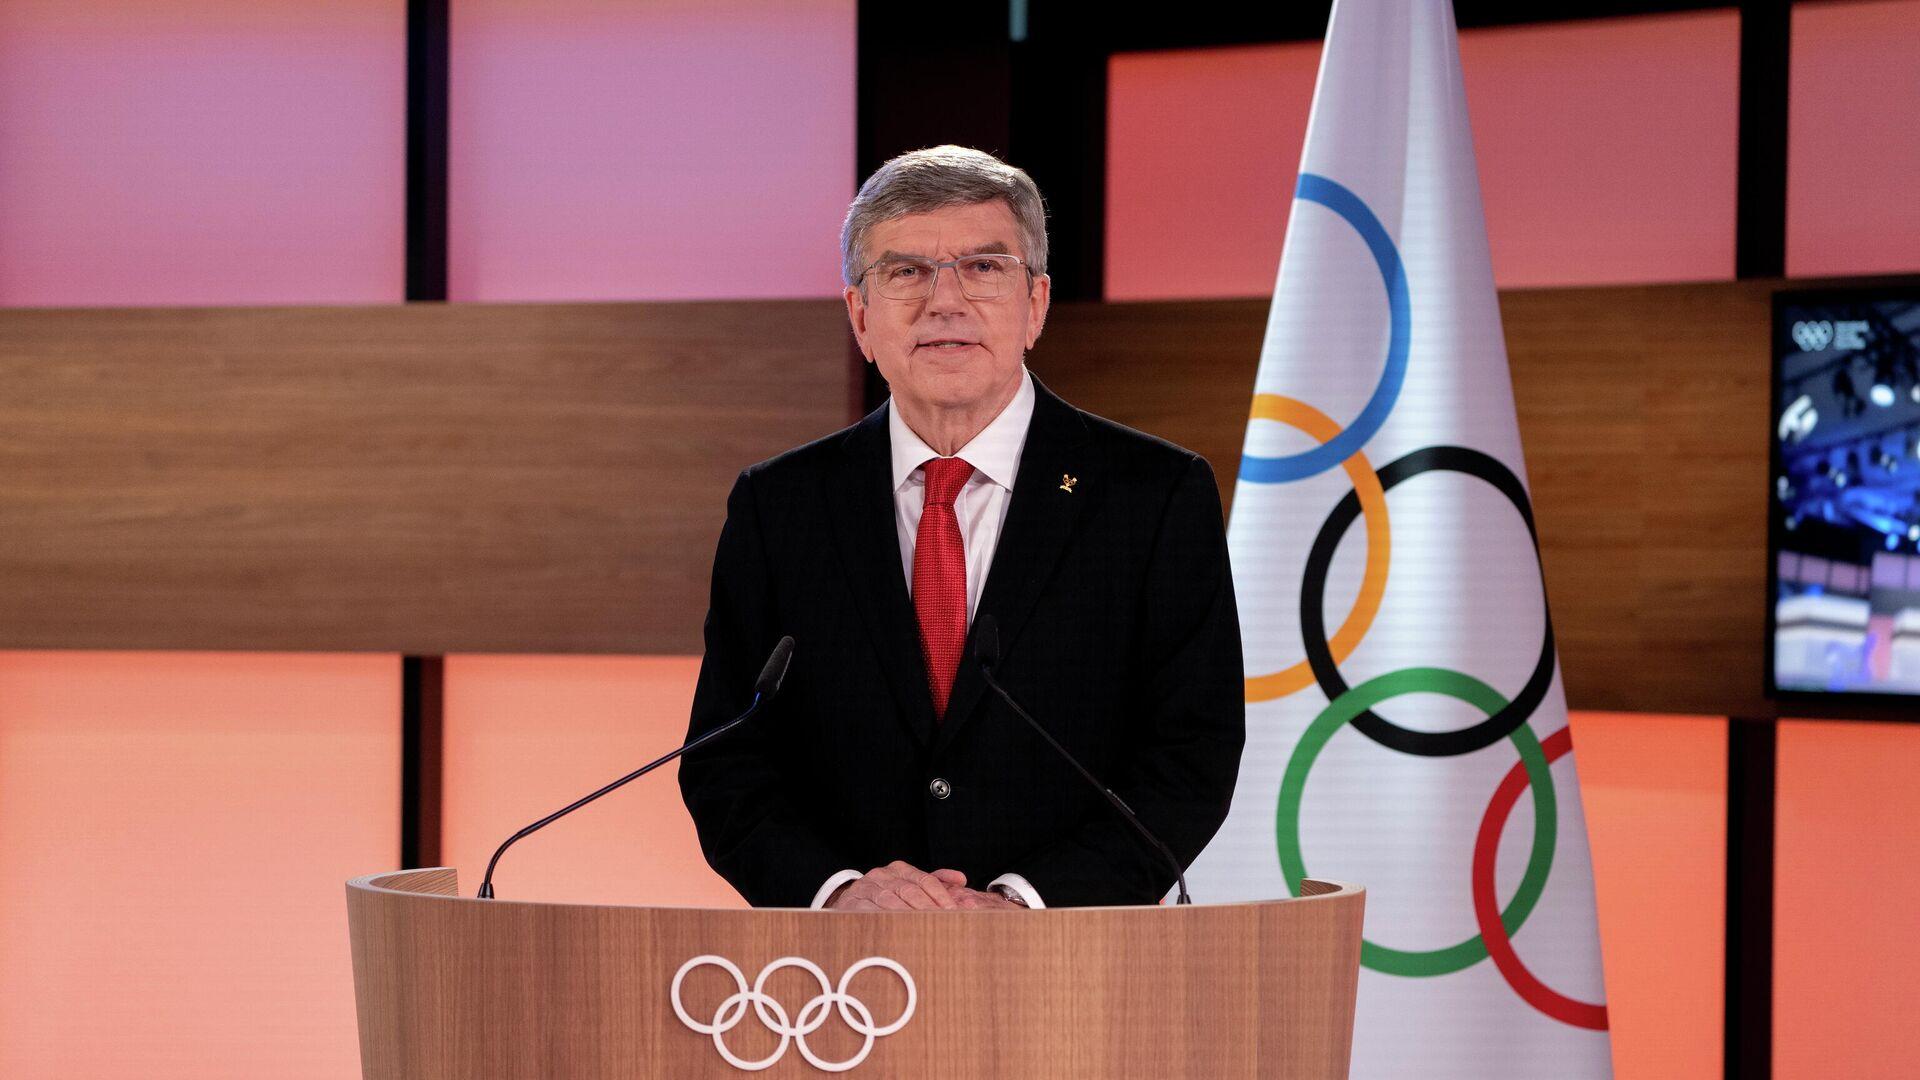 Thomas Bach, el presidente del Comité Olímpico Internacional - Sputnik Mundo, 1920, 10.03.2021